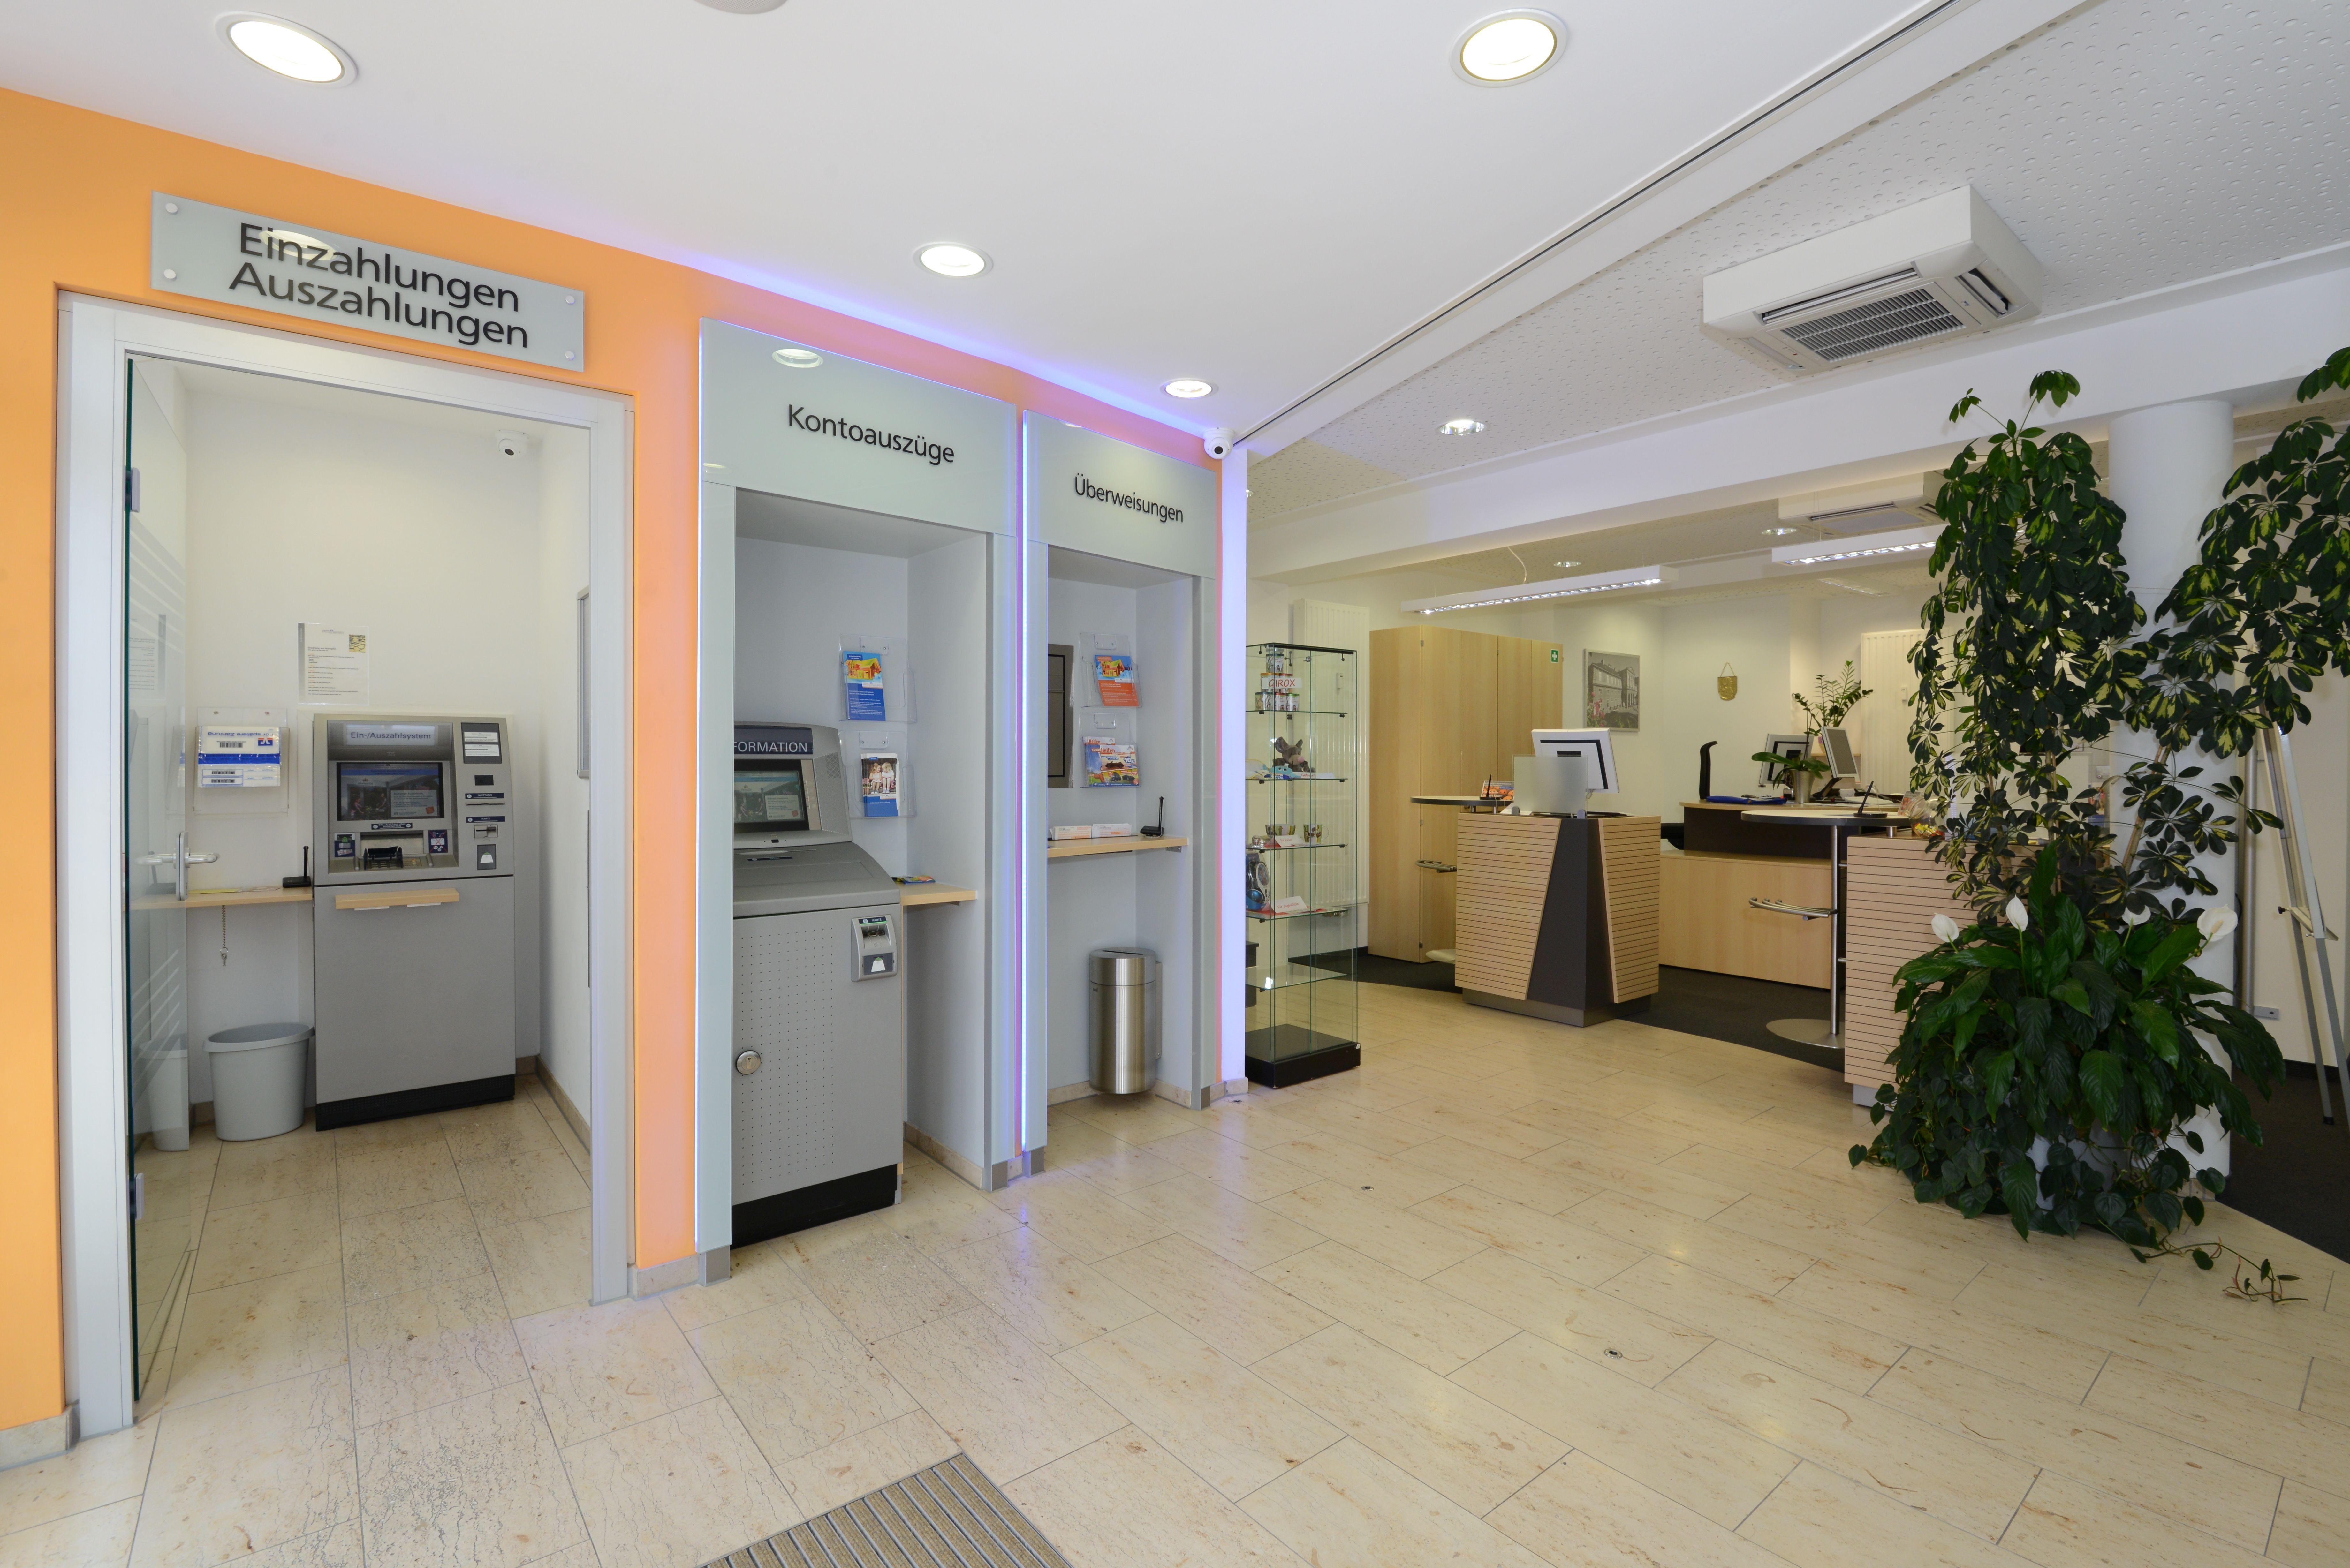 Geldautomat - Volksbank Raiffeisenbank Bayern Mitte eG